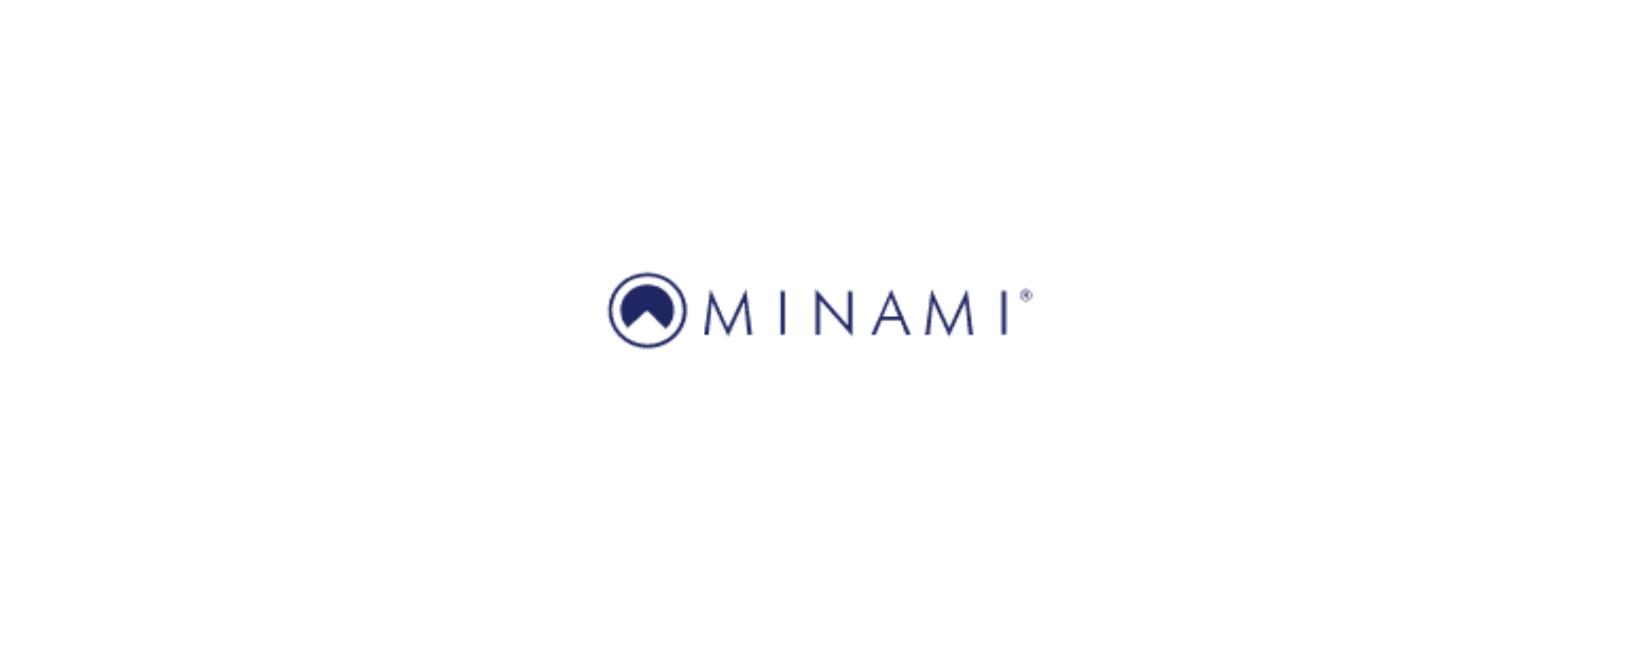 Minami UK Discount Code 2021